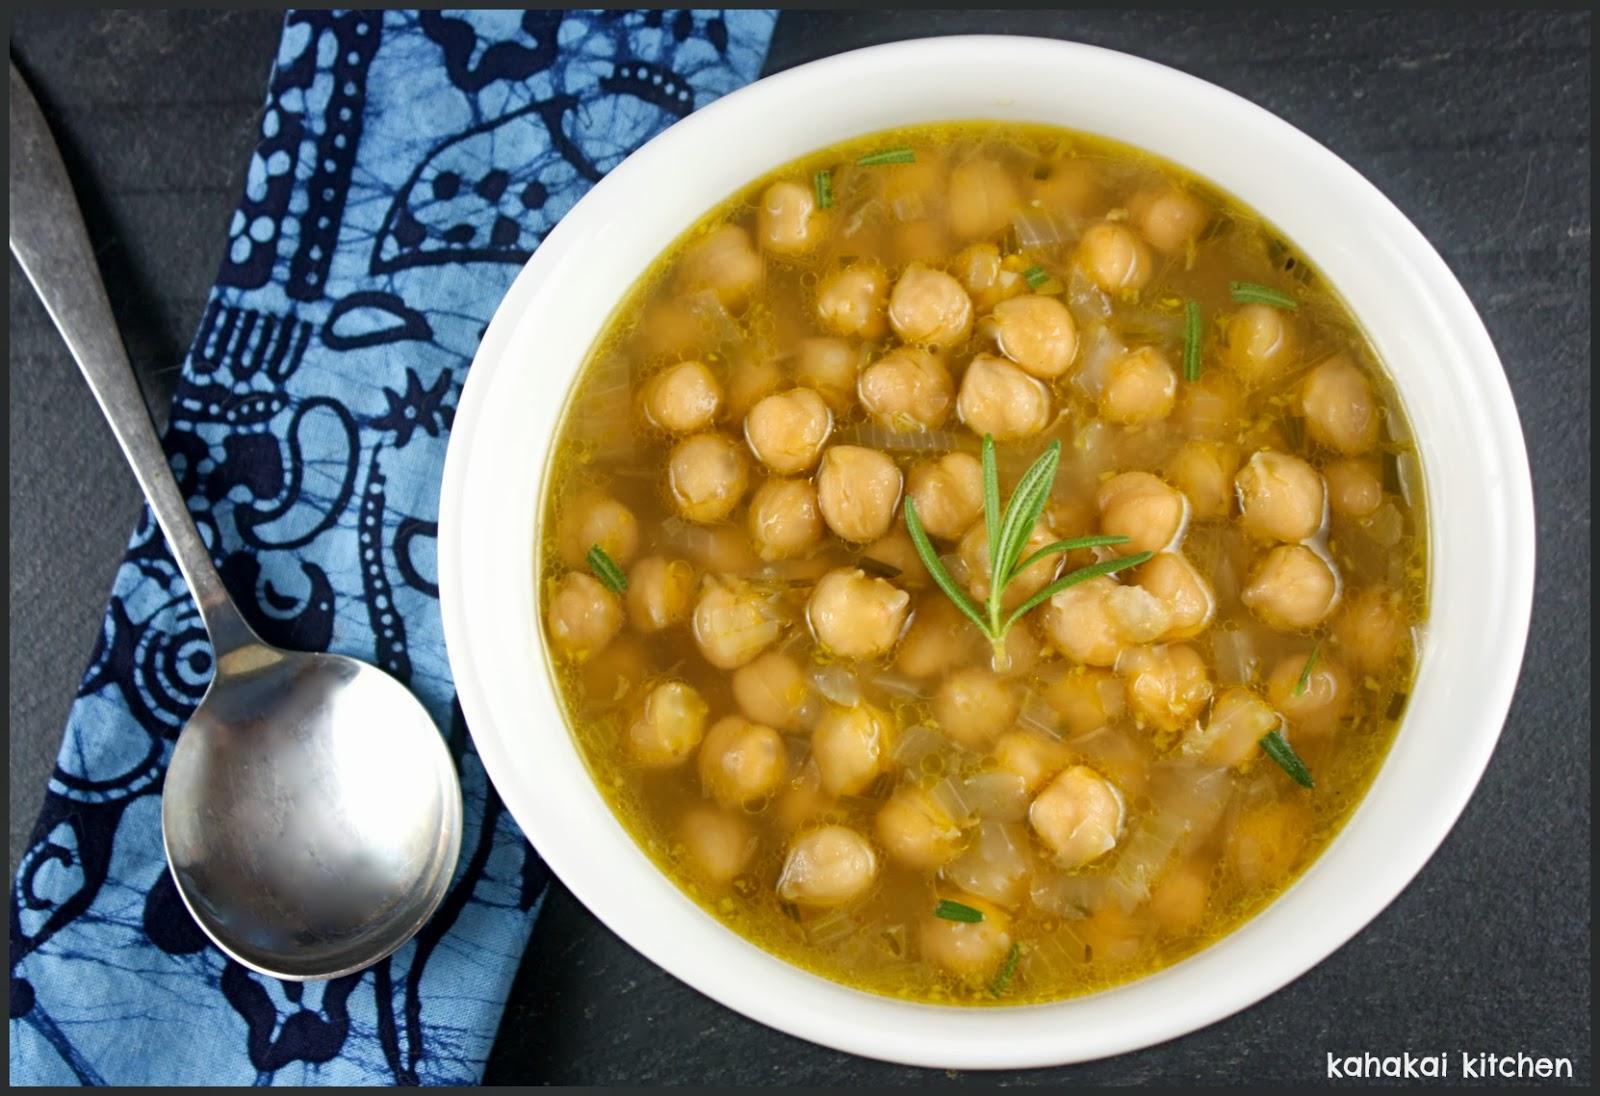 Kahakai Kitchen: Simple Chickpea Soup: Sometimes Simple is ...